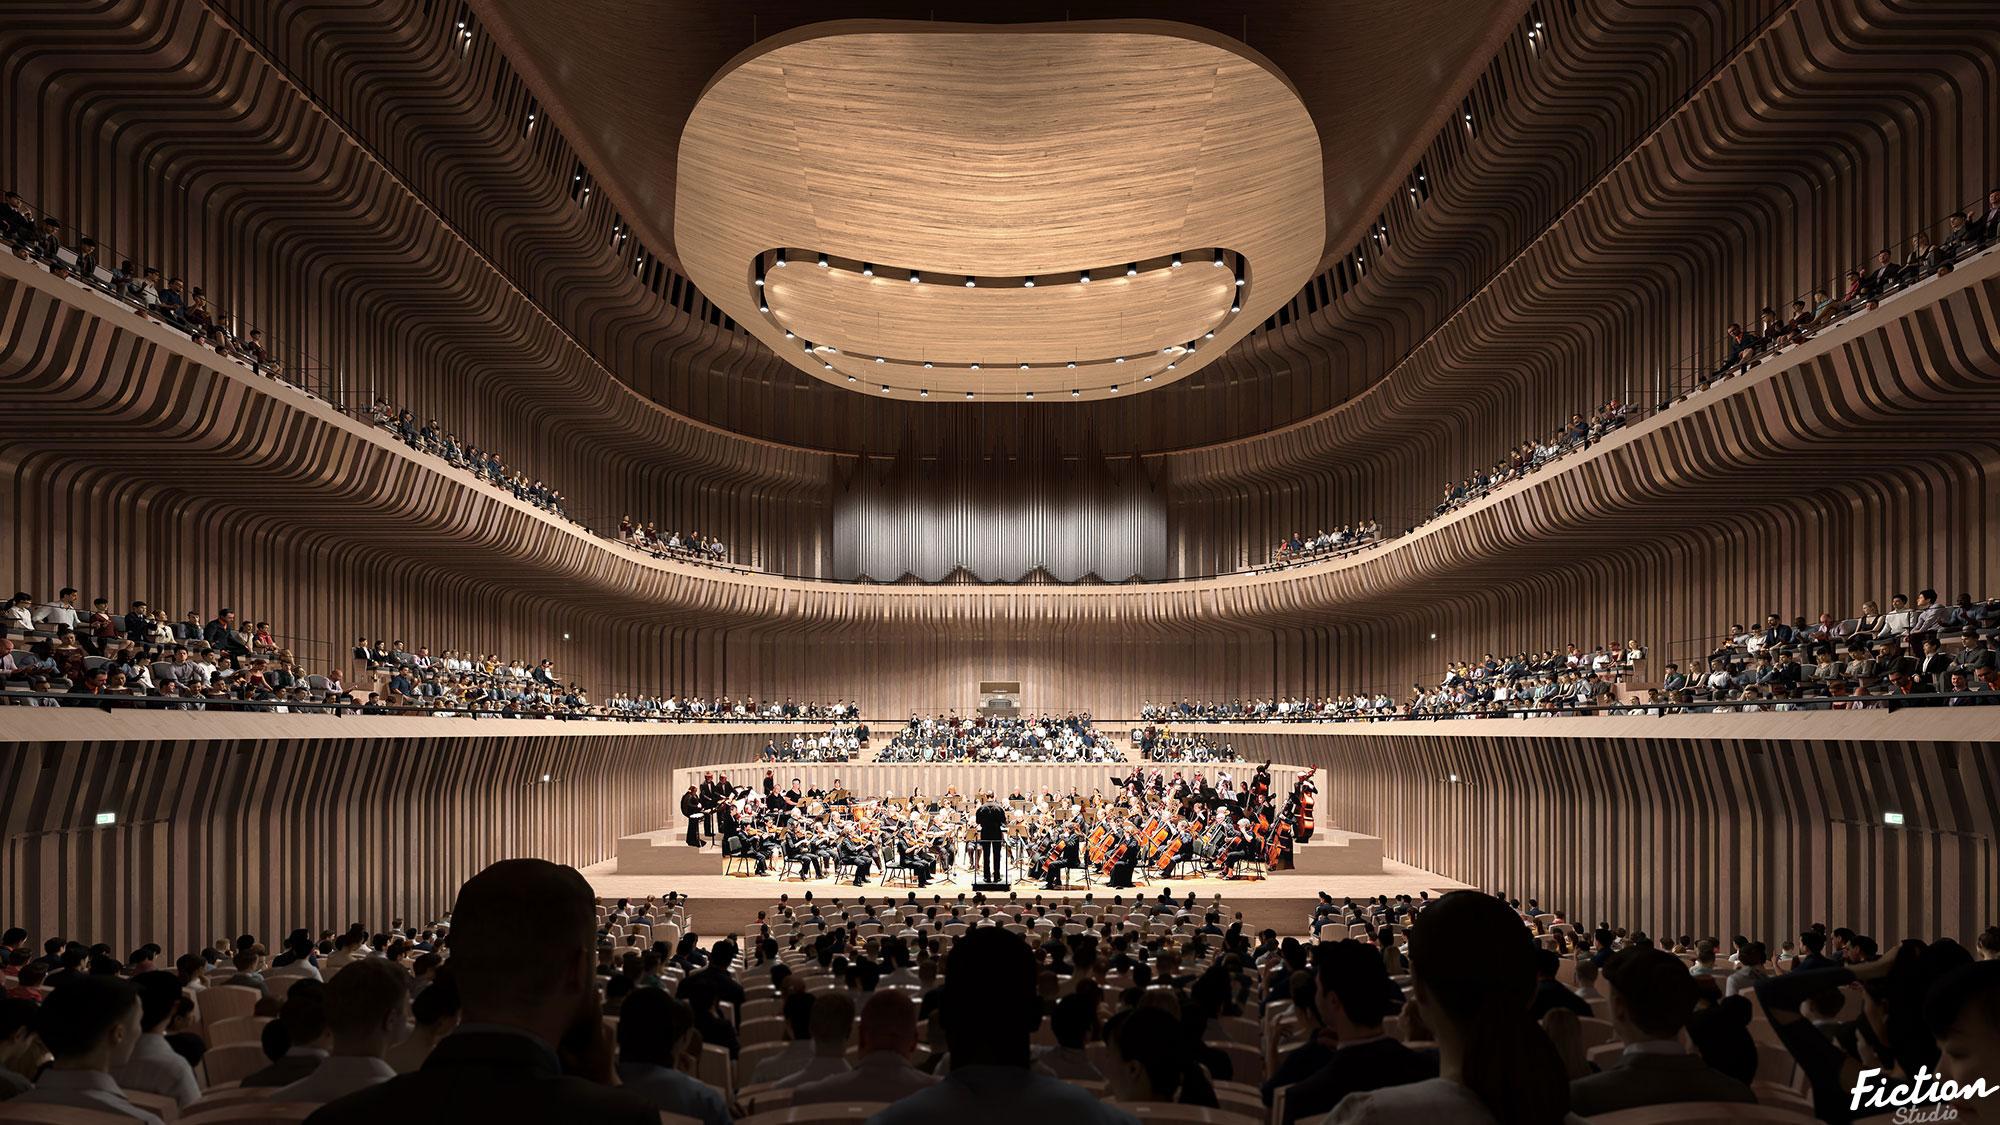 Mecanoo - Muncih Concert Hall - Germany